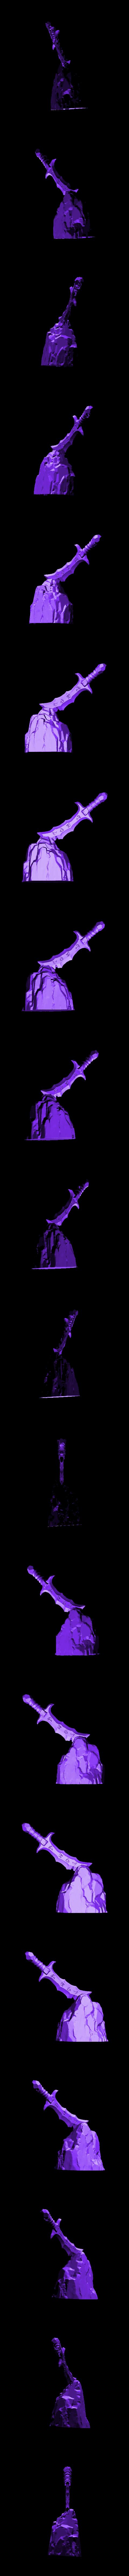 sword-stone.stl Download free STL file Stylized Sword • 3D print object, CarlCreates